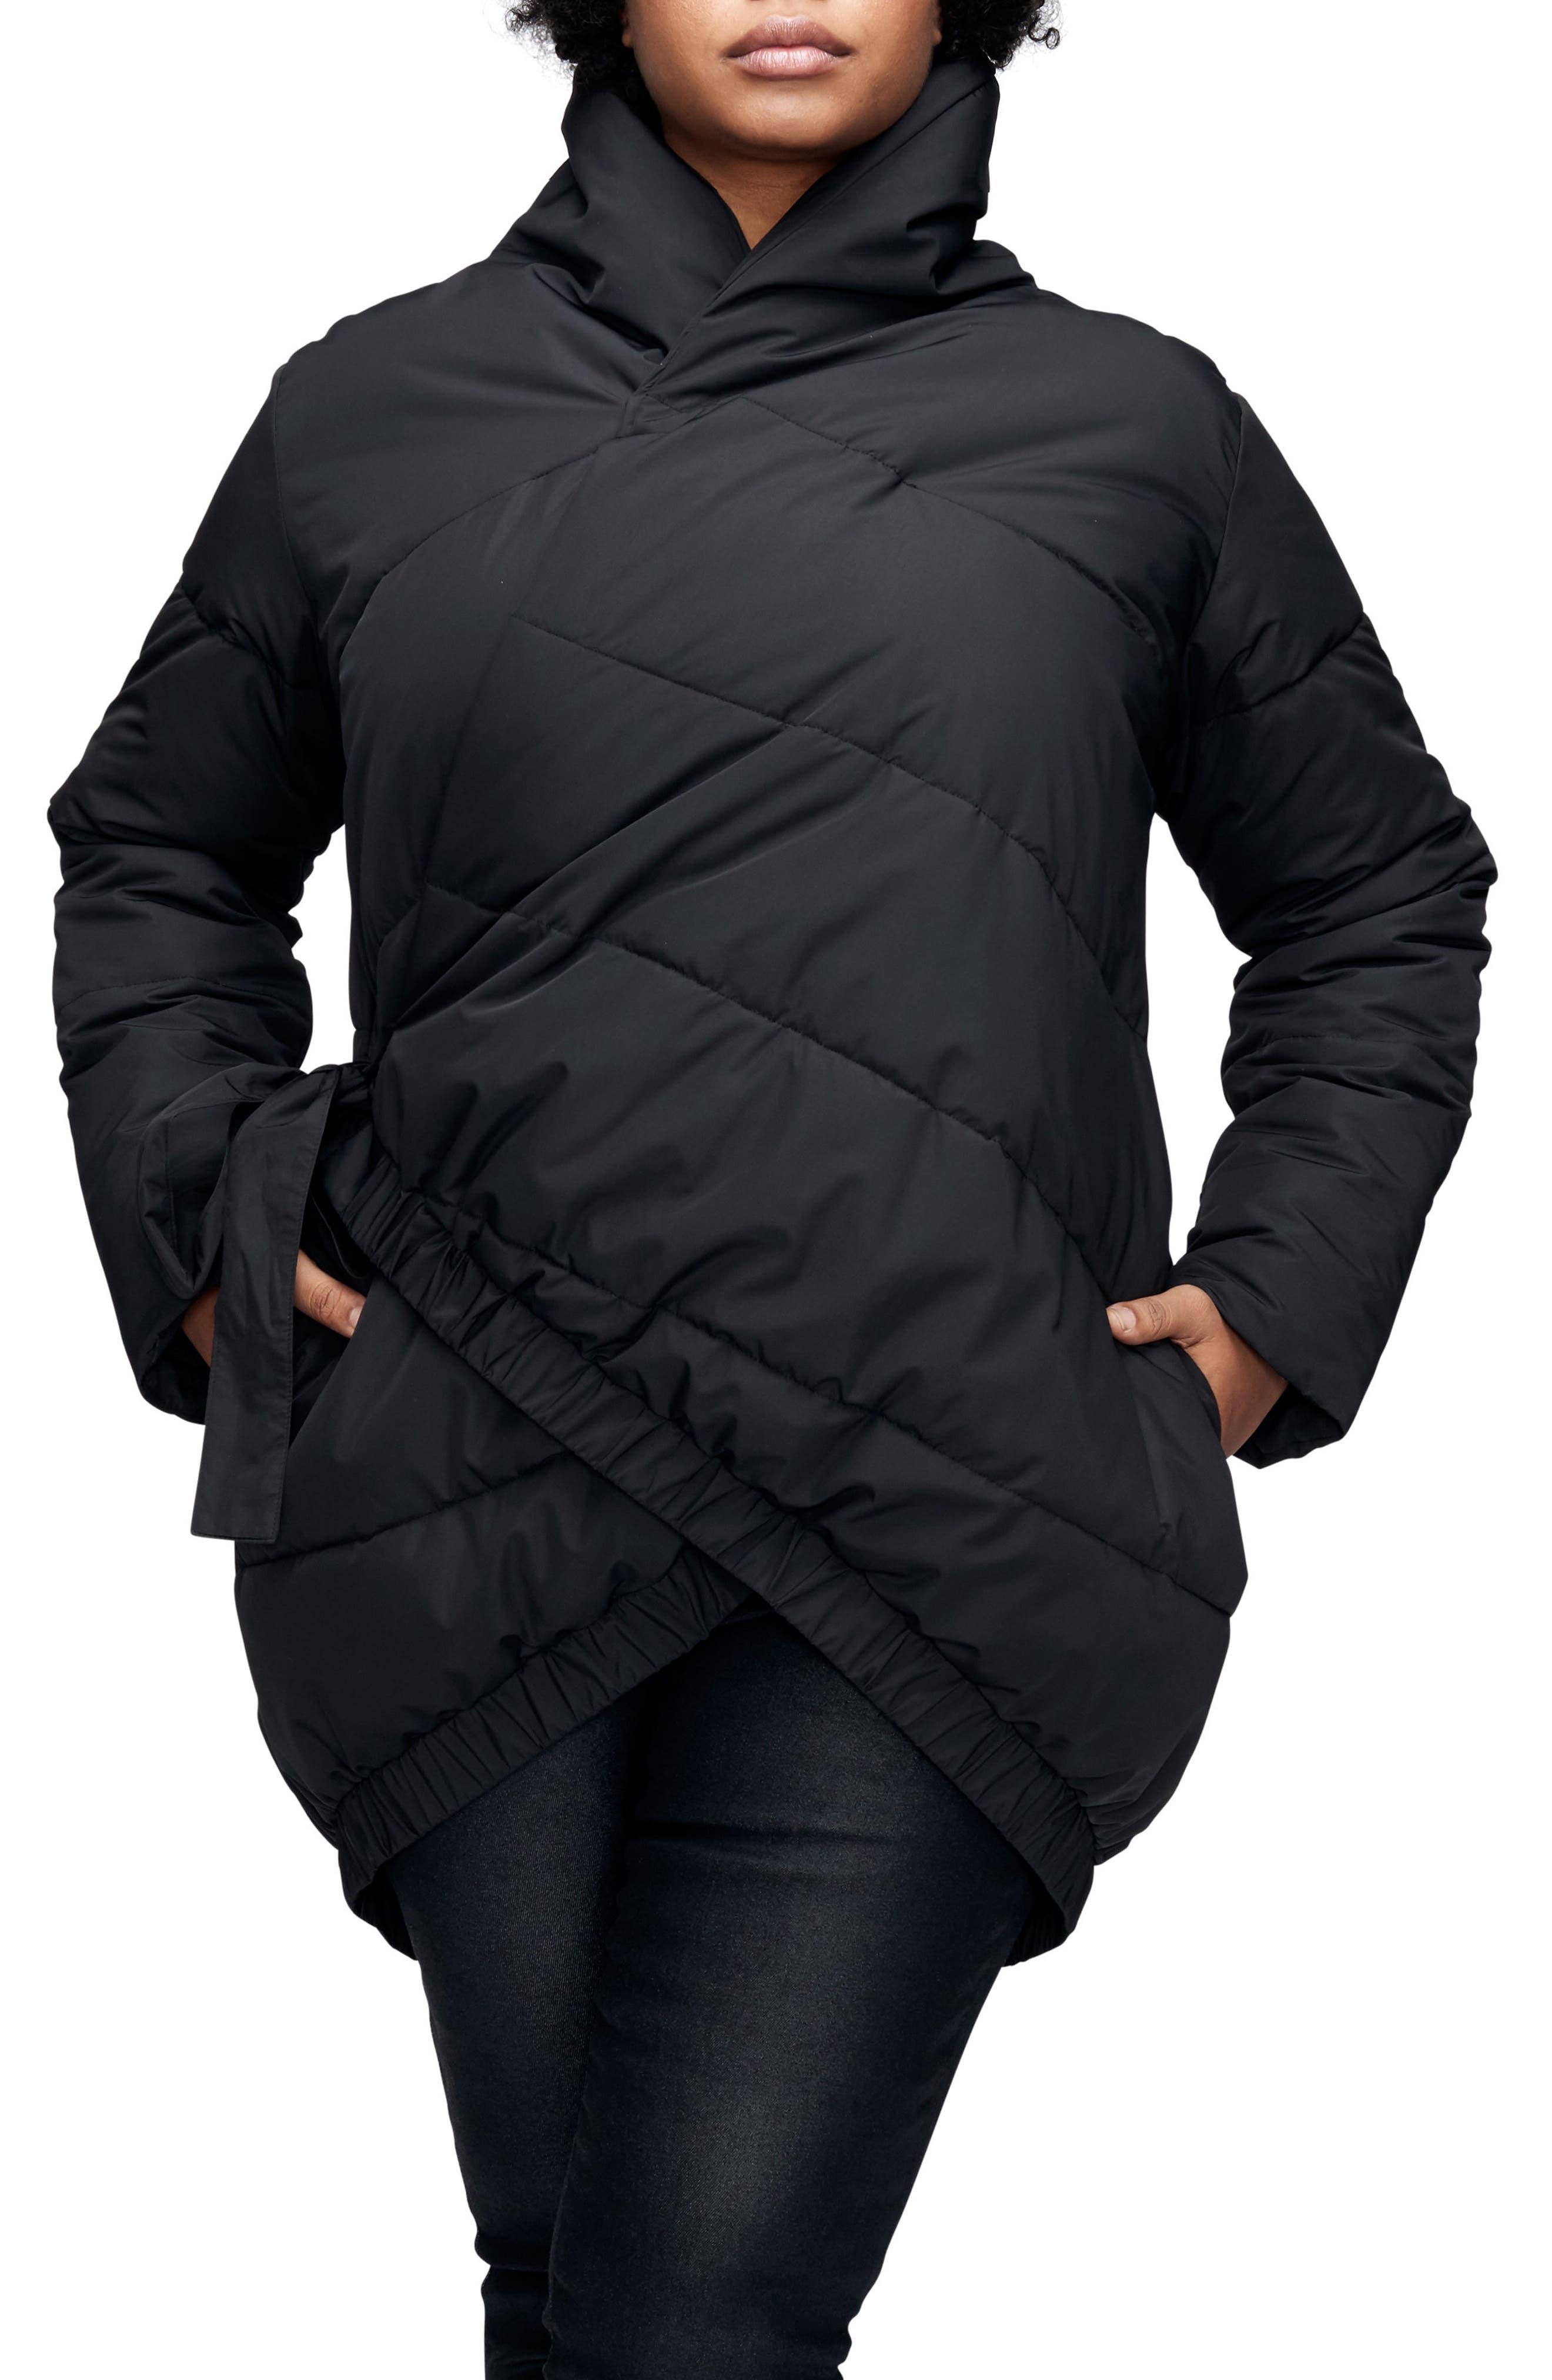 UNIVERSAL STANDARD, Kanda Puffer Coat, Main thumbnail 1, color, BLACK